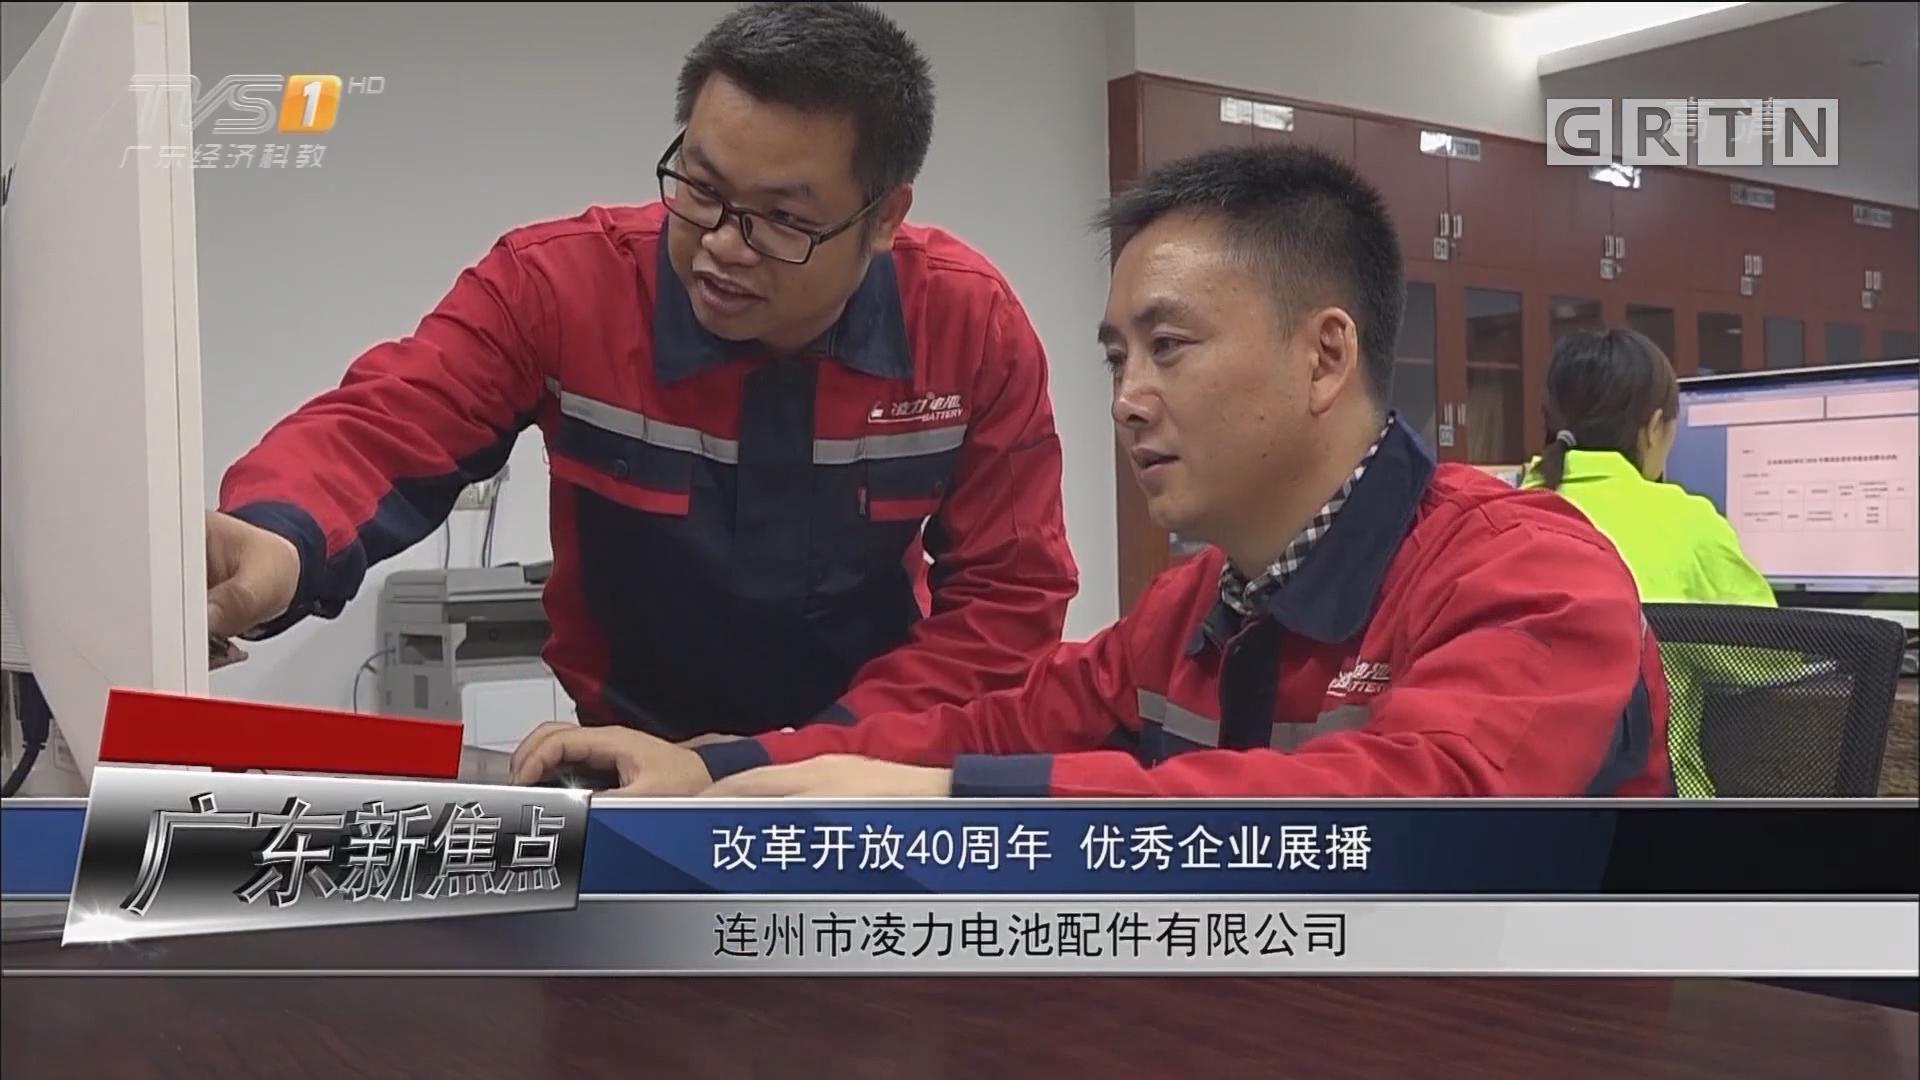 [HD][2018-12-29]广东新焦点:改革开放40周年 优秀企业展播